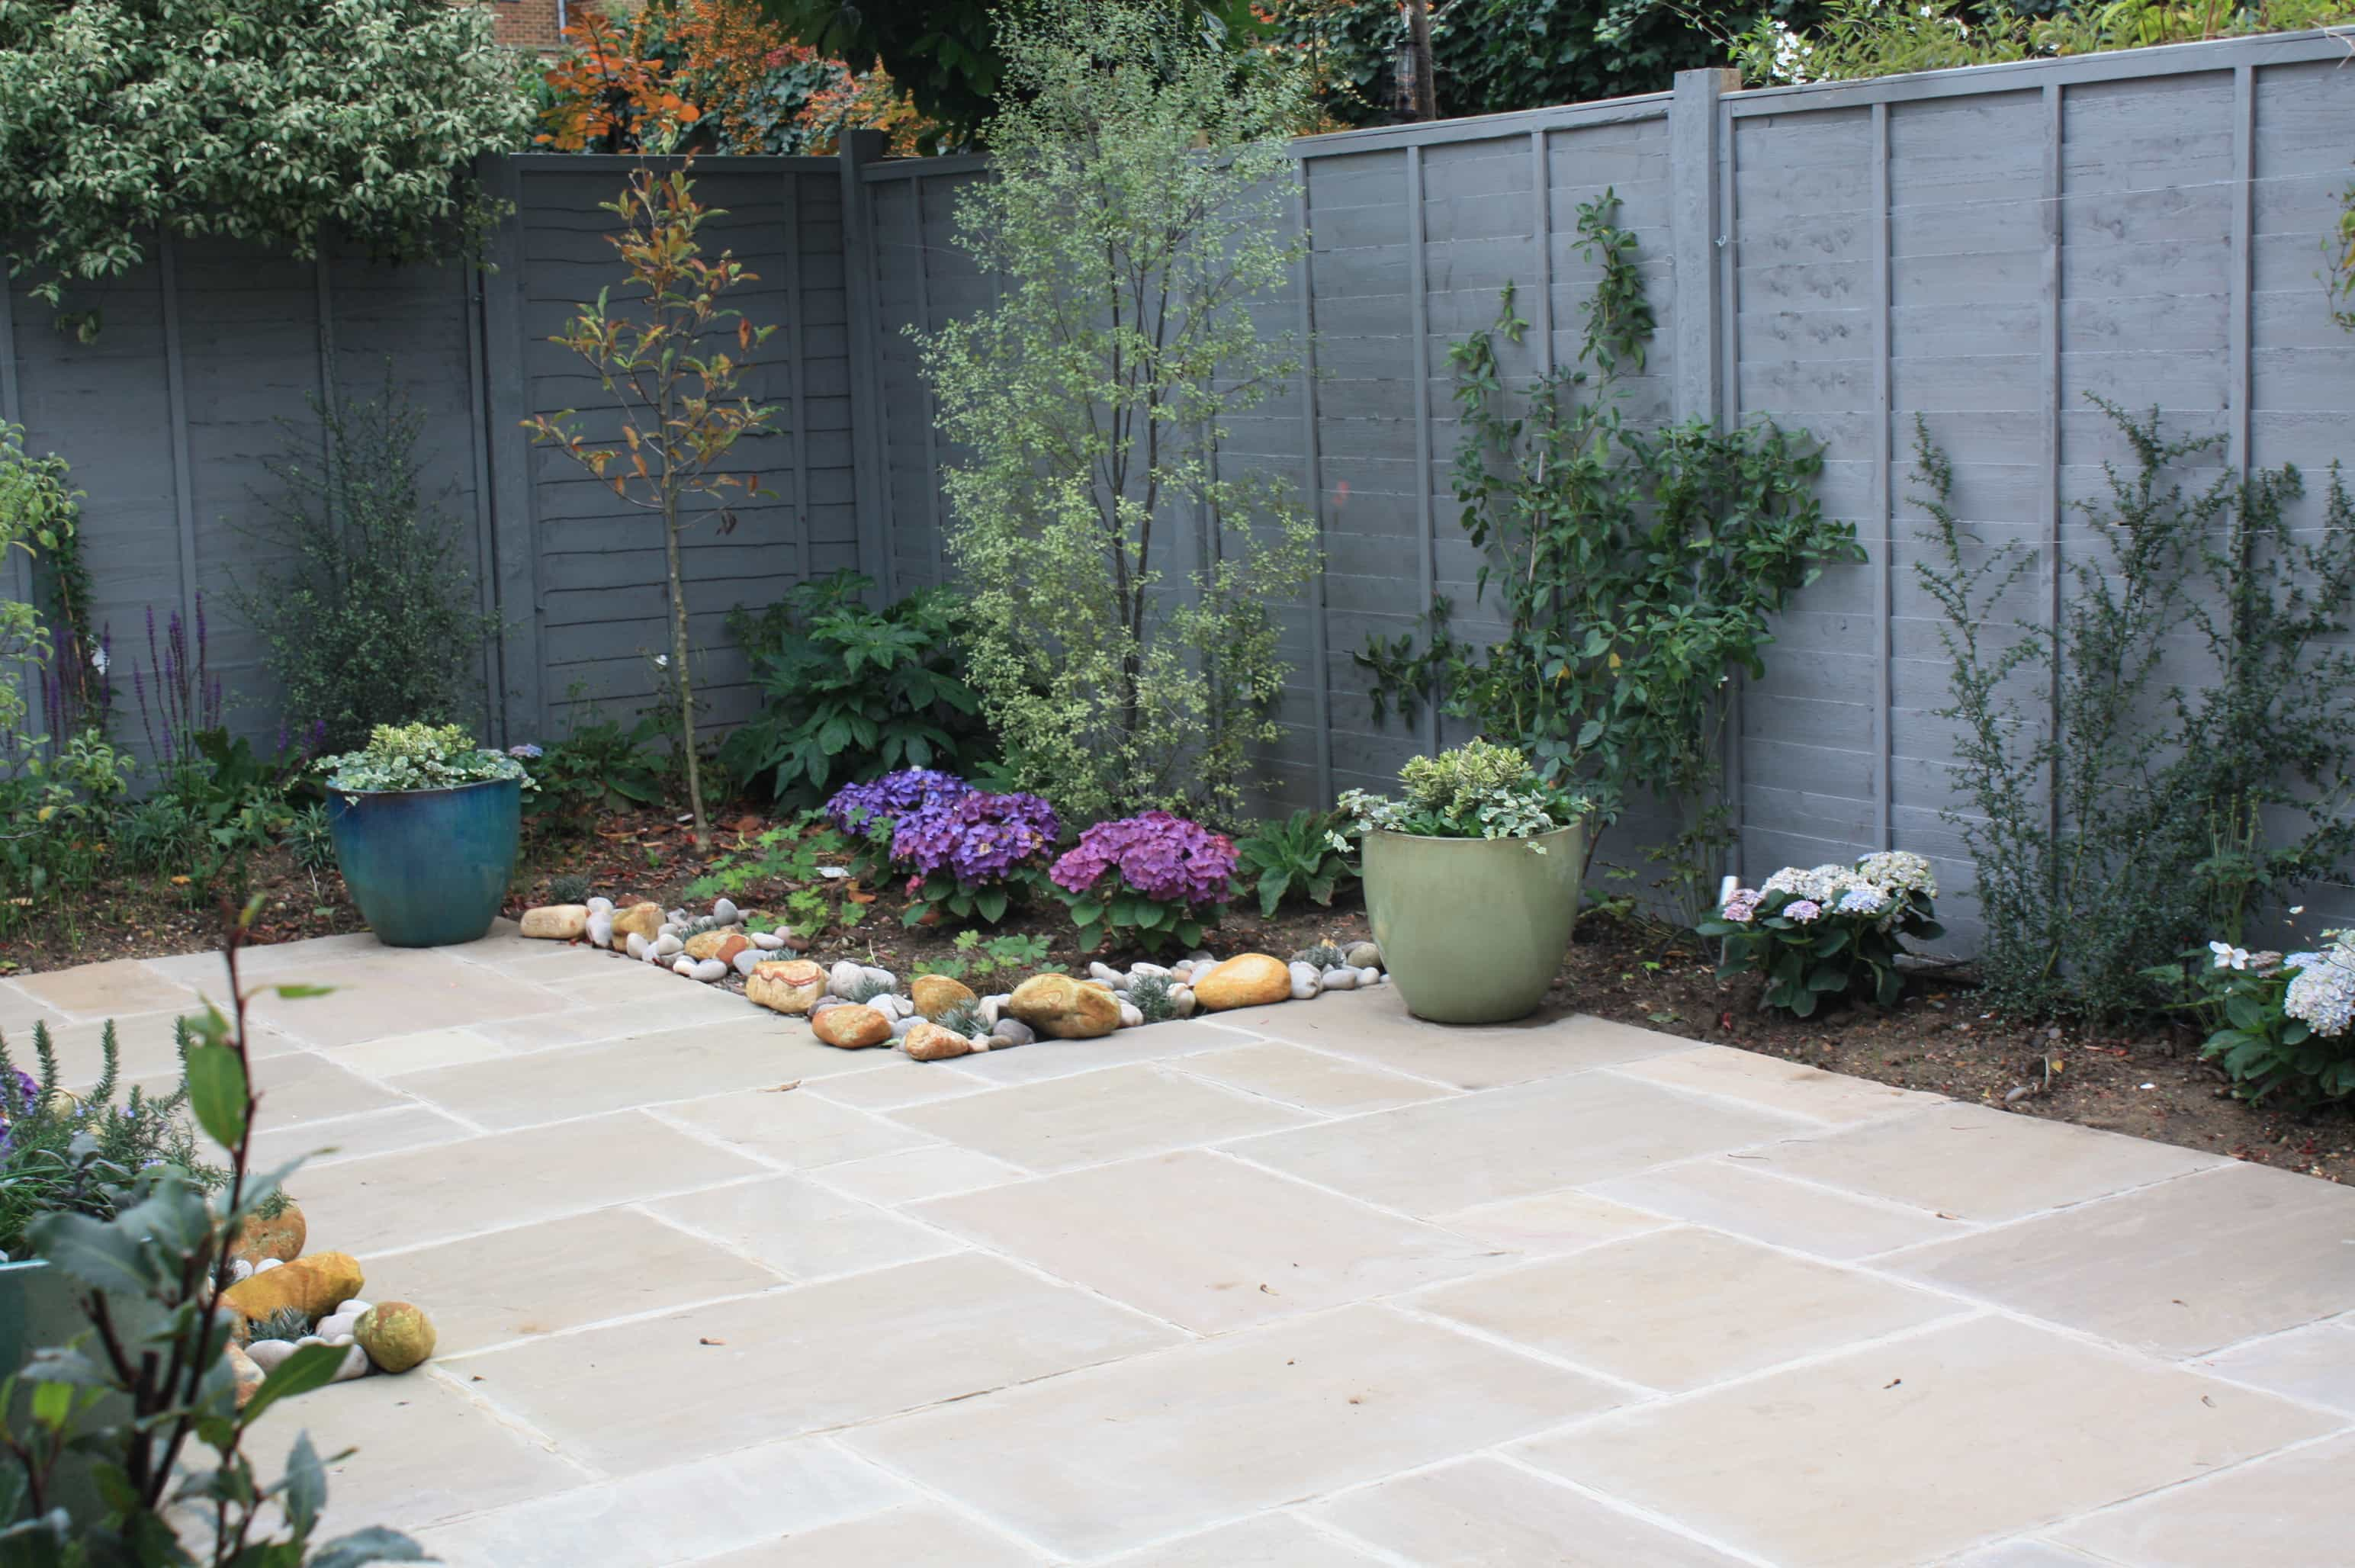 peckham blue garden planted